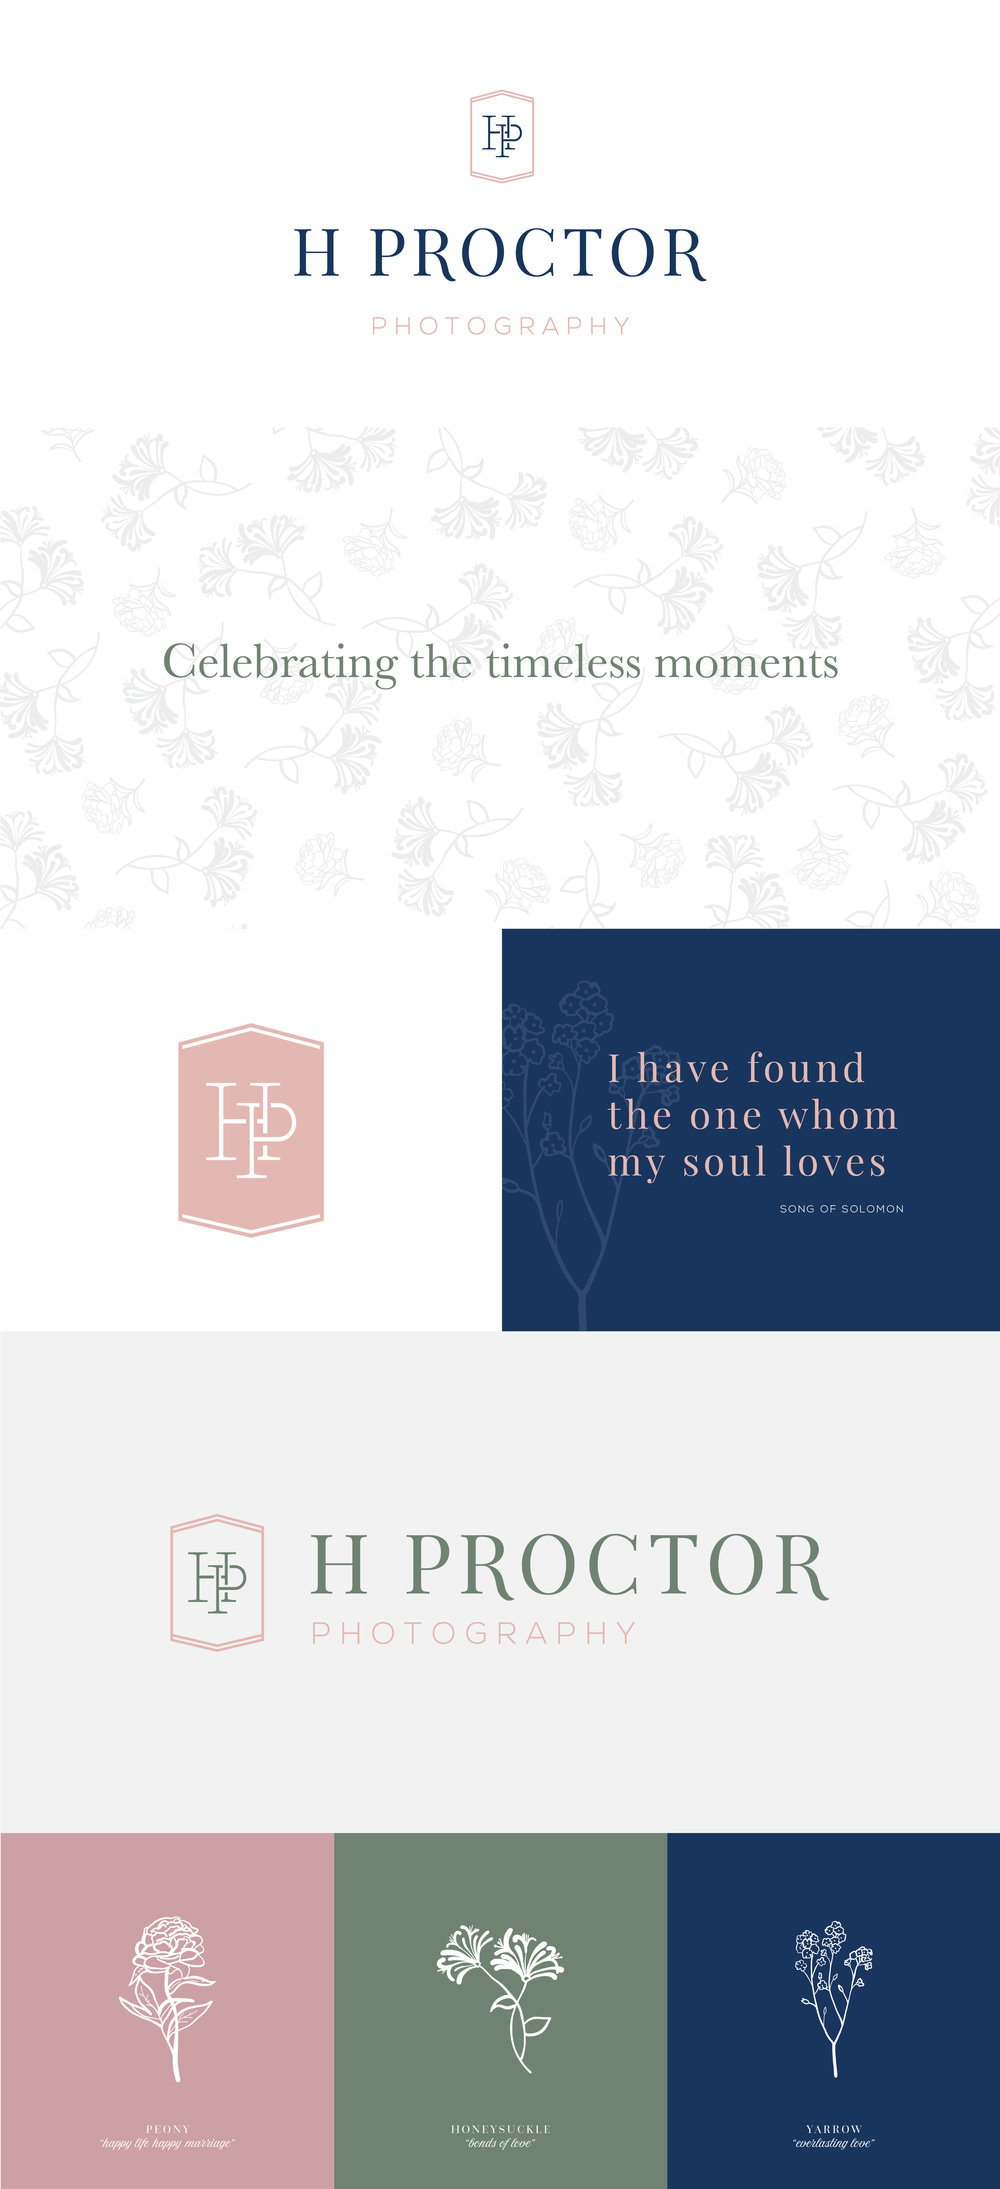 H Proctor Photographer – timeless romantic branding – Hayley Bigham Designs – Tulsa Oklahoma Branding Studio – professional monogram badge